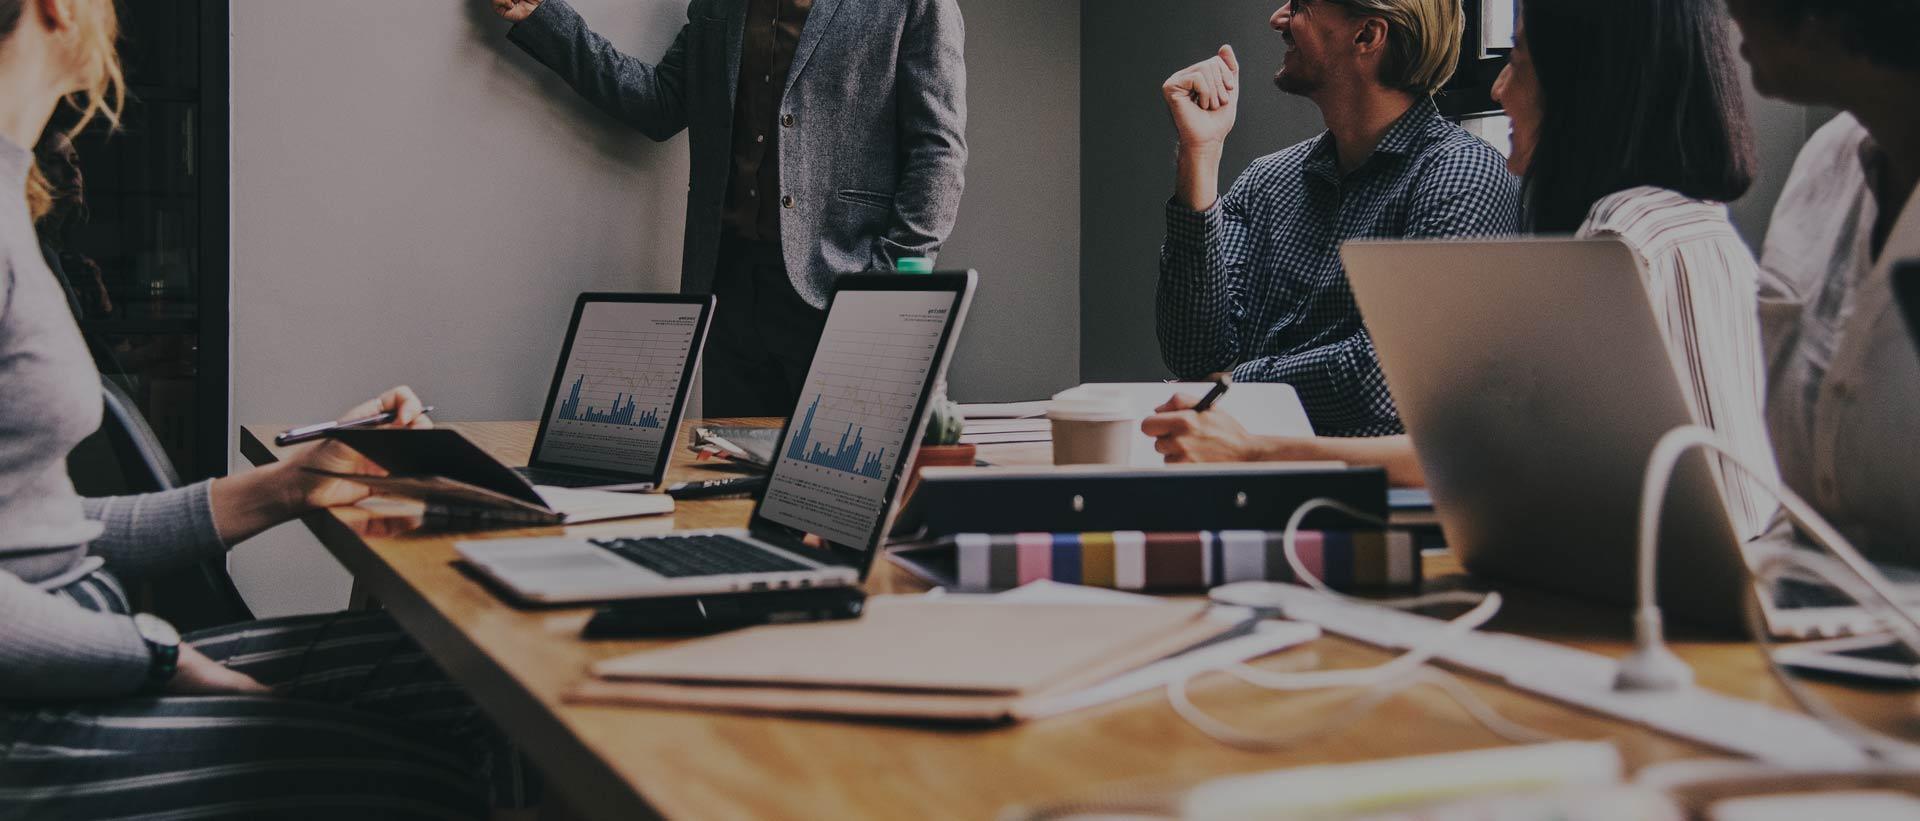 Digital Marketing Agency Jobs Colombo